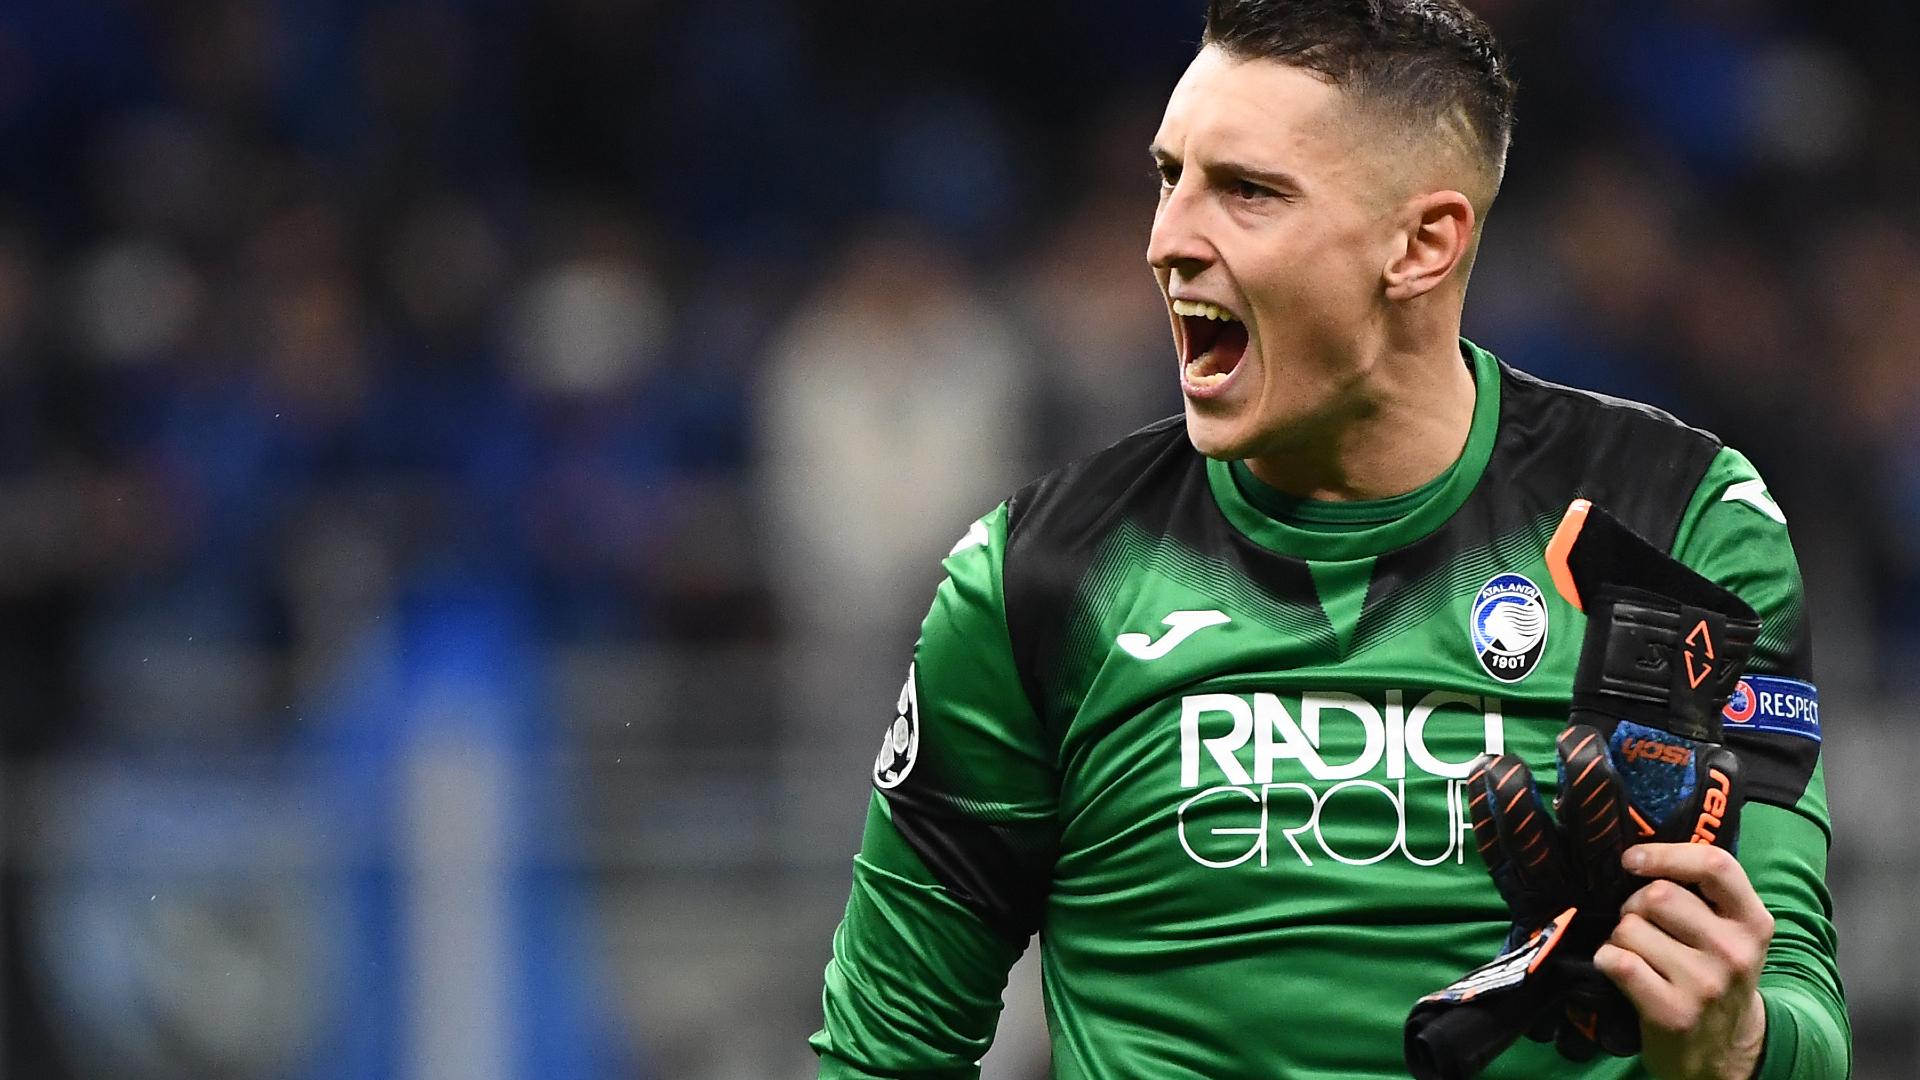 L'Atalanta vince 4-1? Gollini furioso a fine gara per il goal ...